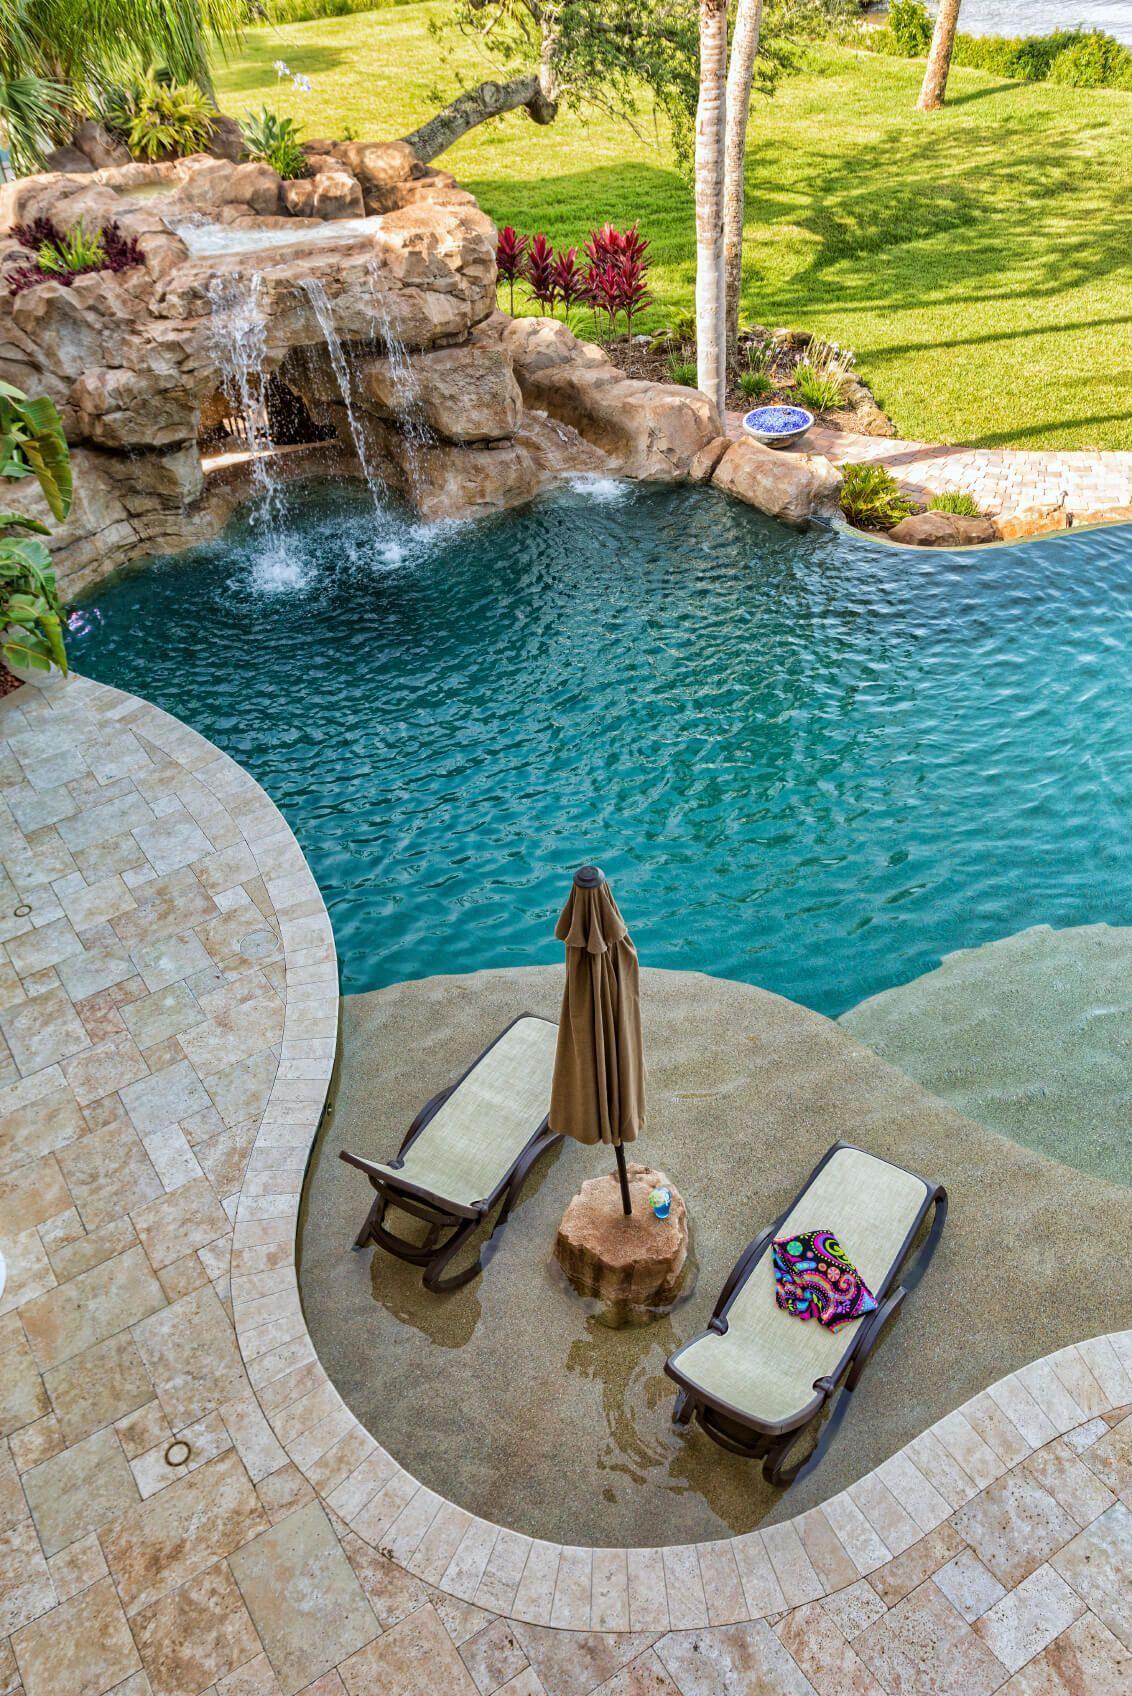 Patios And Decks Swimming Pool Designs Pool Waterfall Diy Swimming Pool